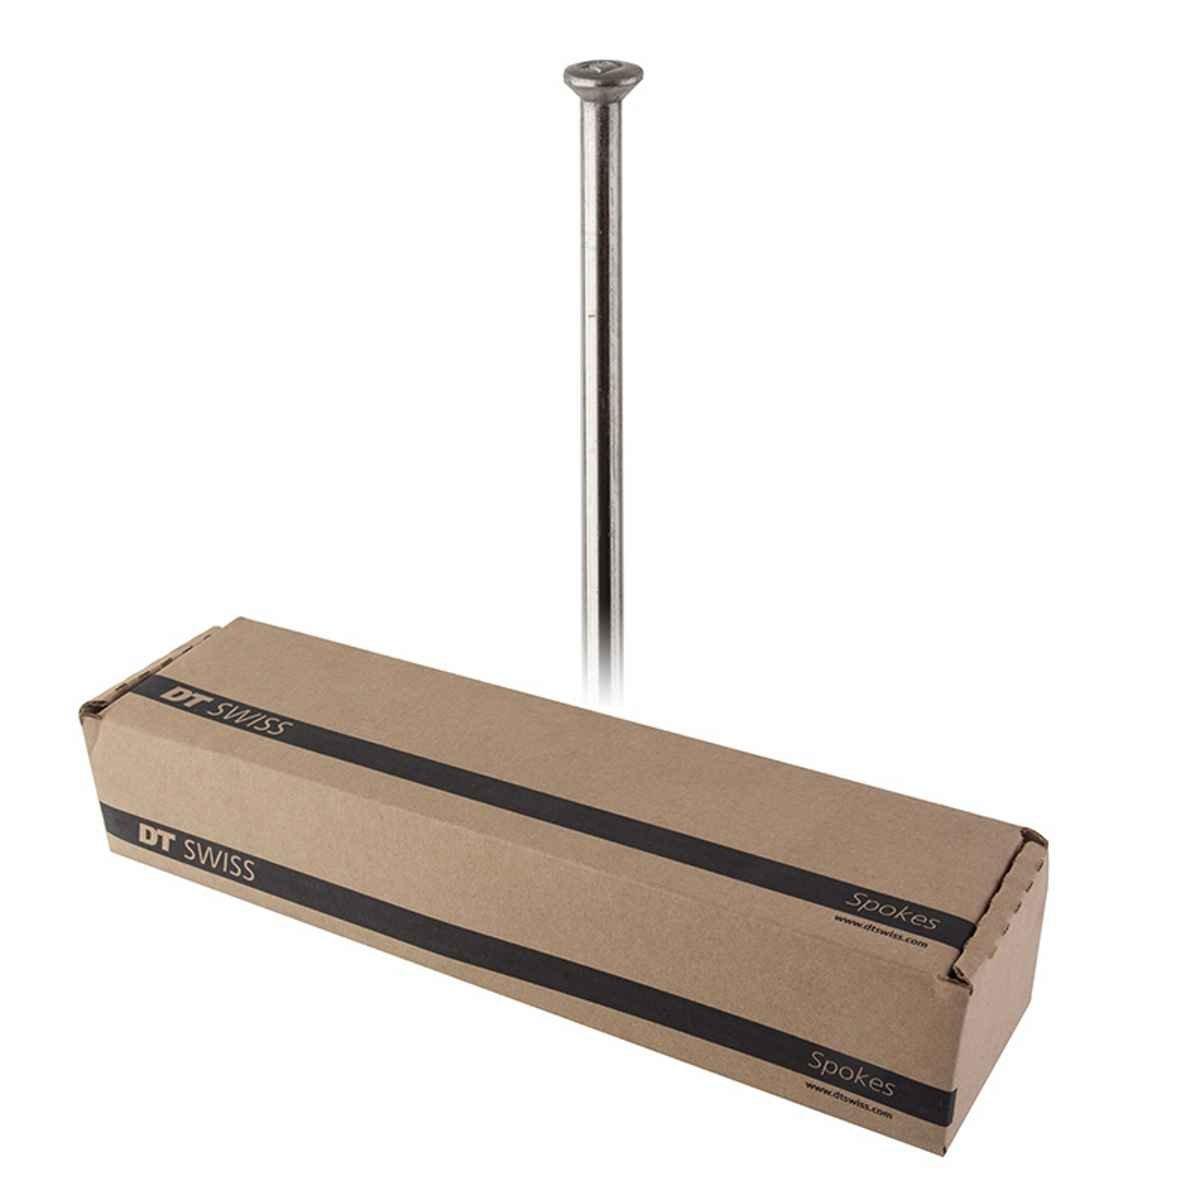 DT Swissチャンピオン2.0空白スポーク: Straight Pull 315 mm Threadlessシルバーボックス   B07B4M3WZL